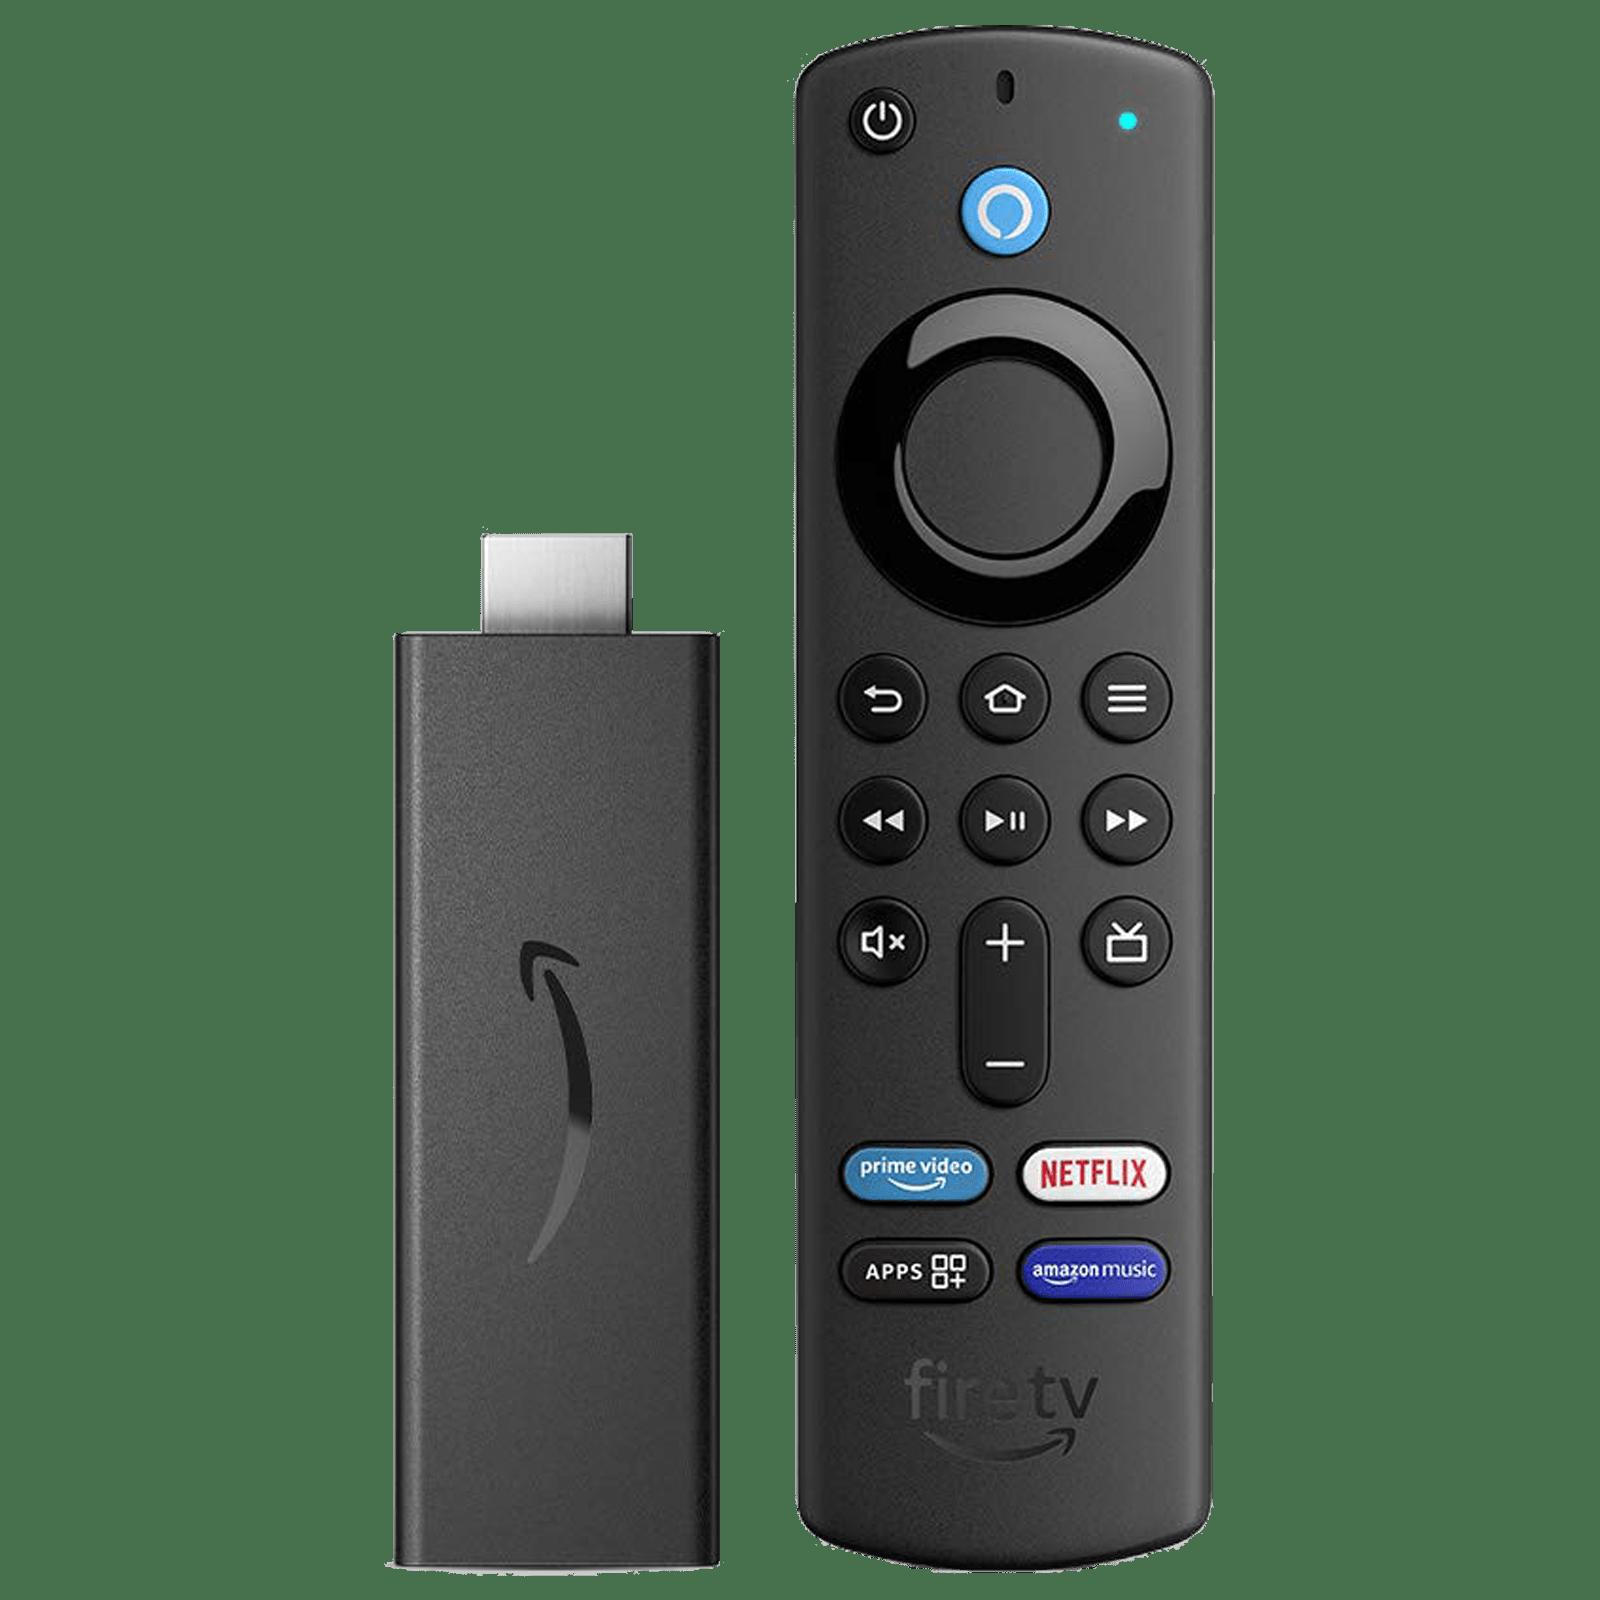 Amazon Fire TV Stick 3rd Gen with Alexa Voice Remote (Quad Core Processor, B08C1KQRR5, Black)